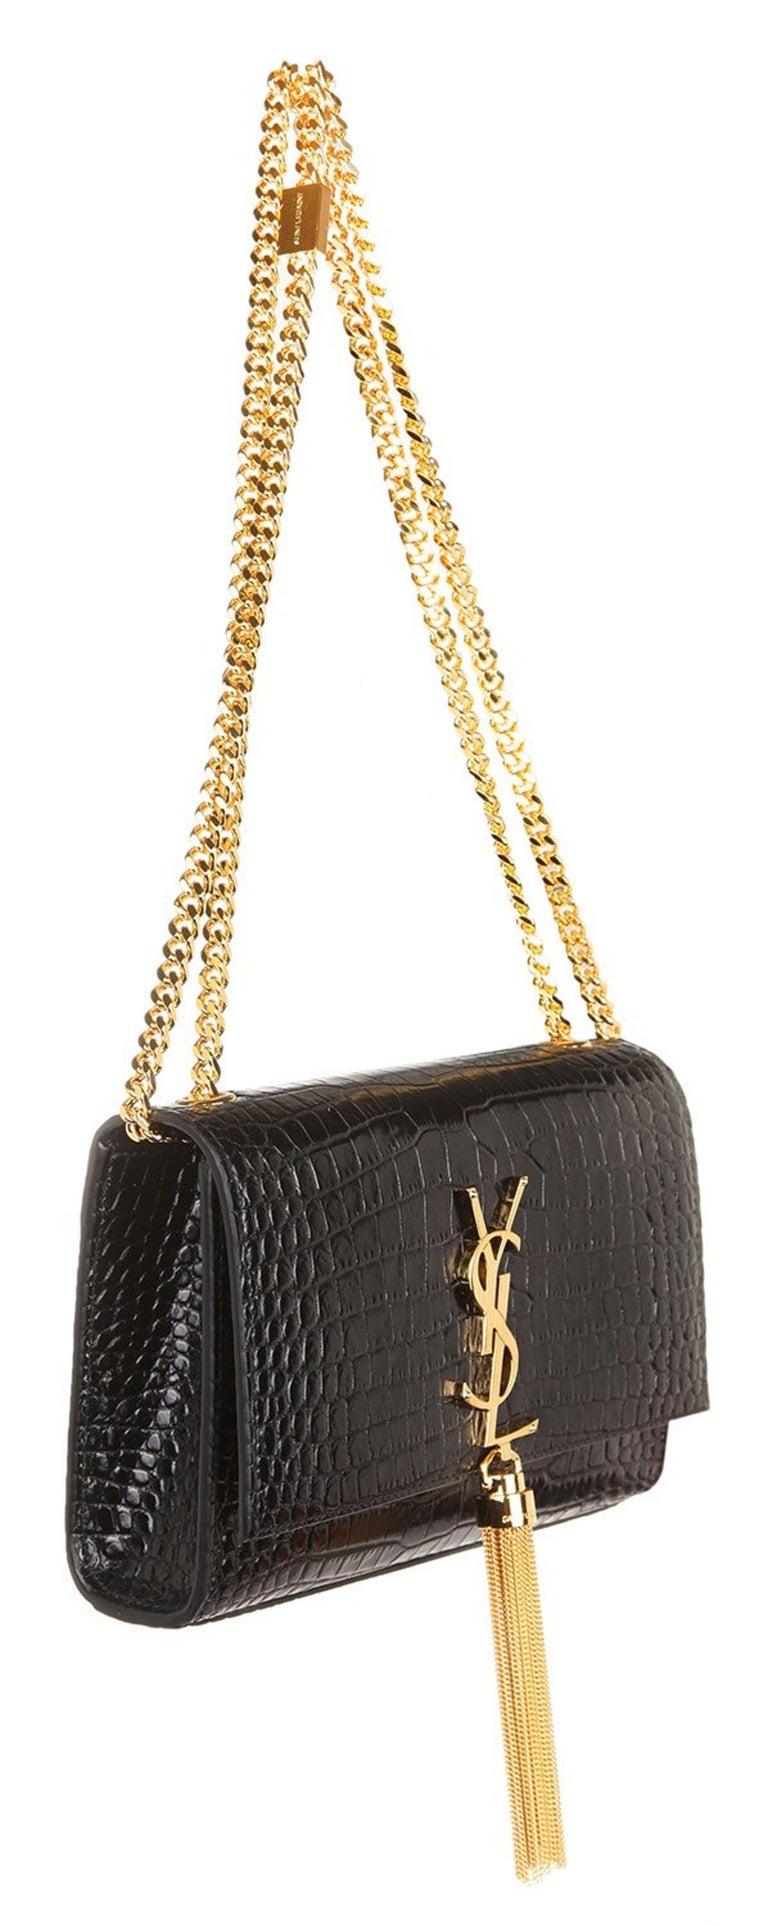 Ysl Saint Laurent Croc Embossed Small Kate Bag With Tassel